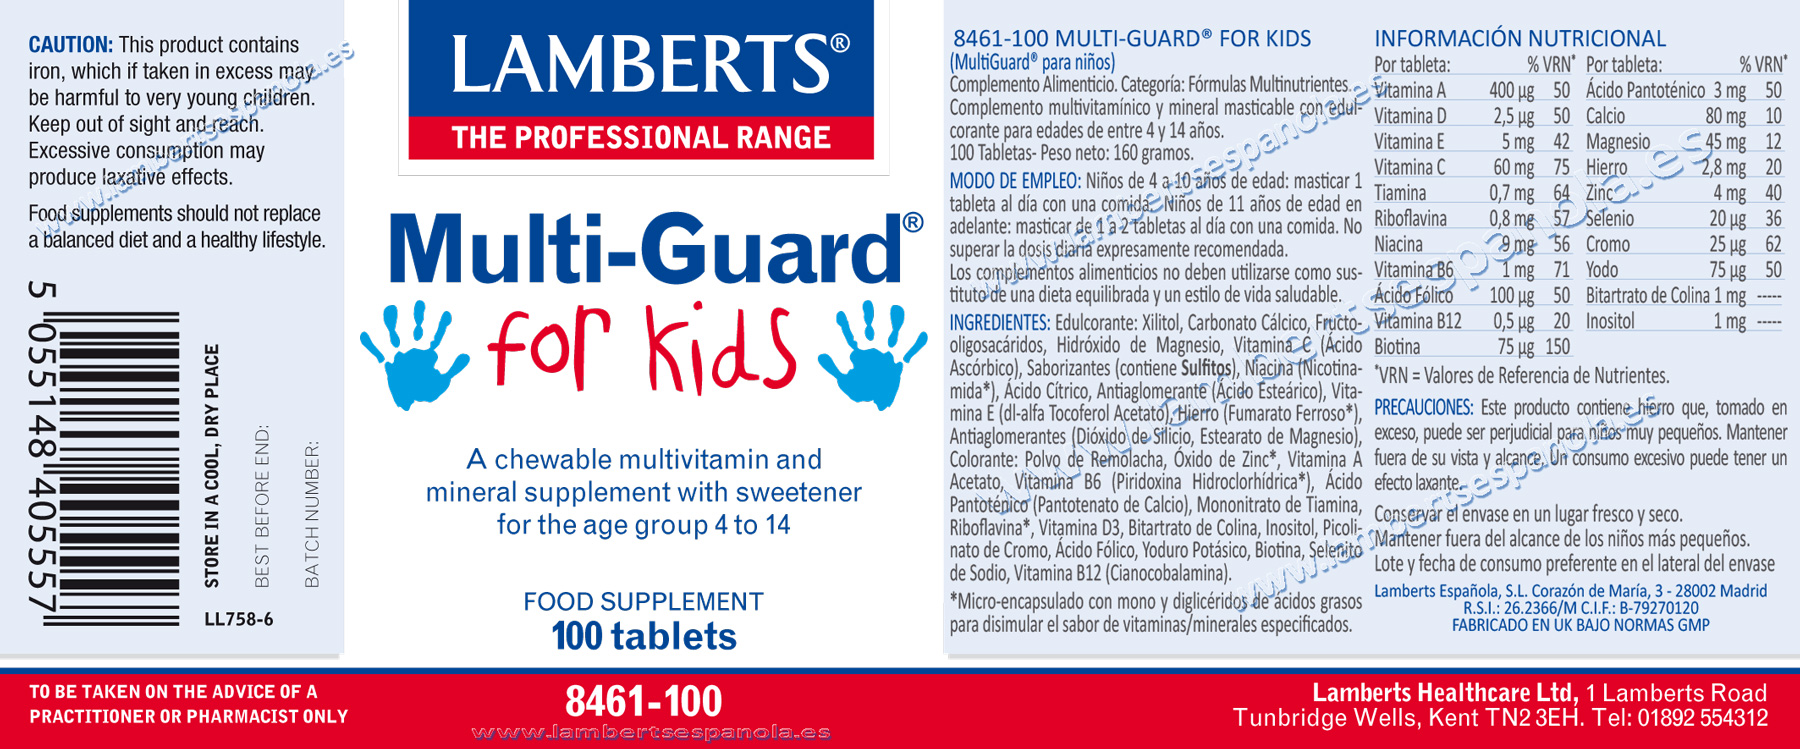 Multiguard Kids